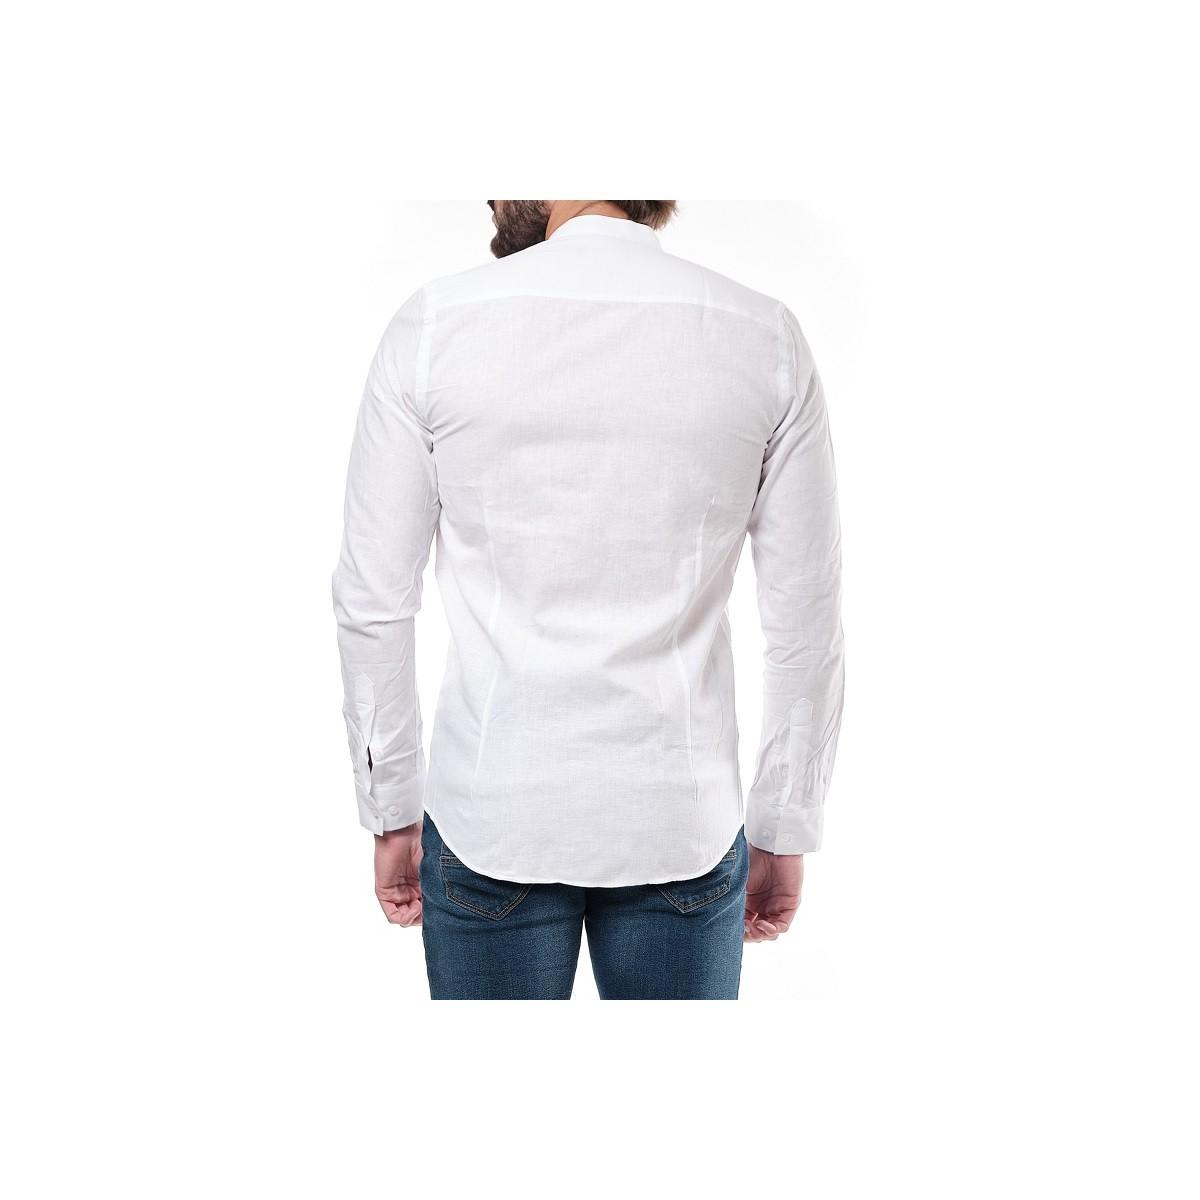 T-shirt Agni